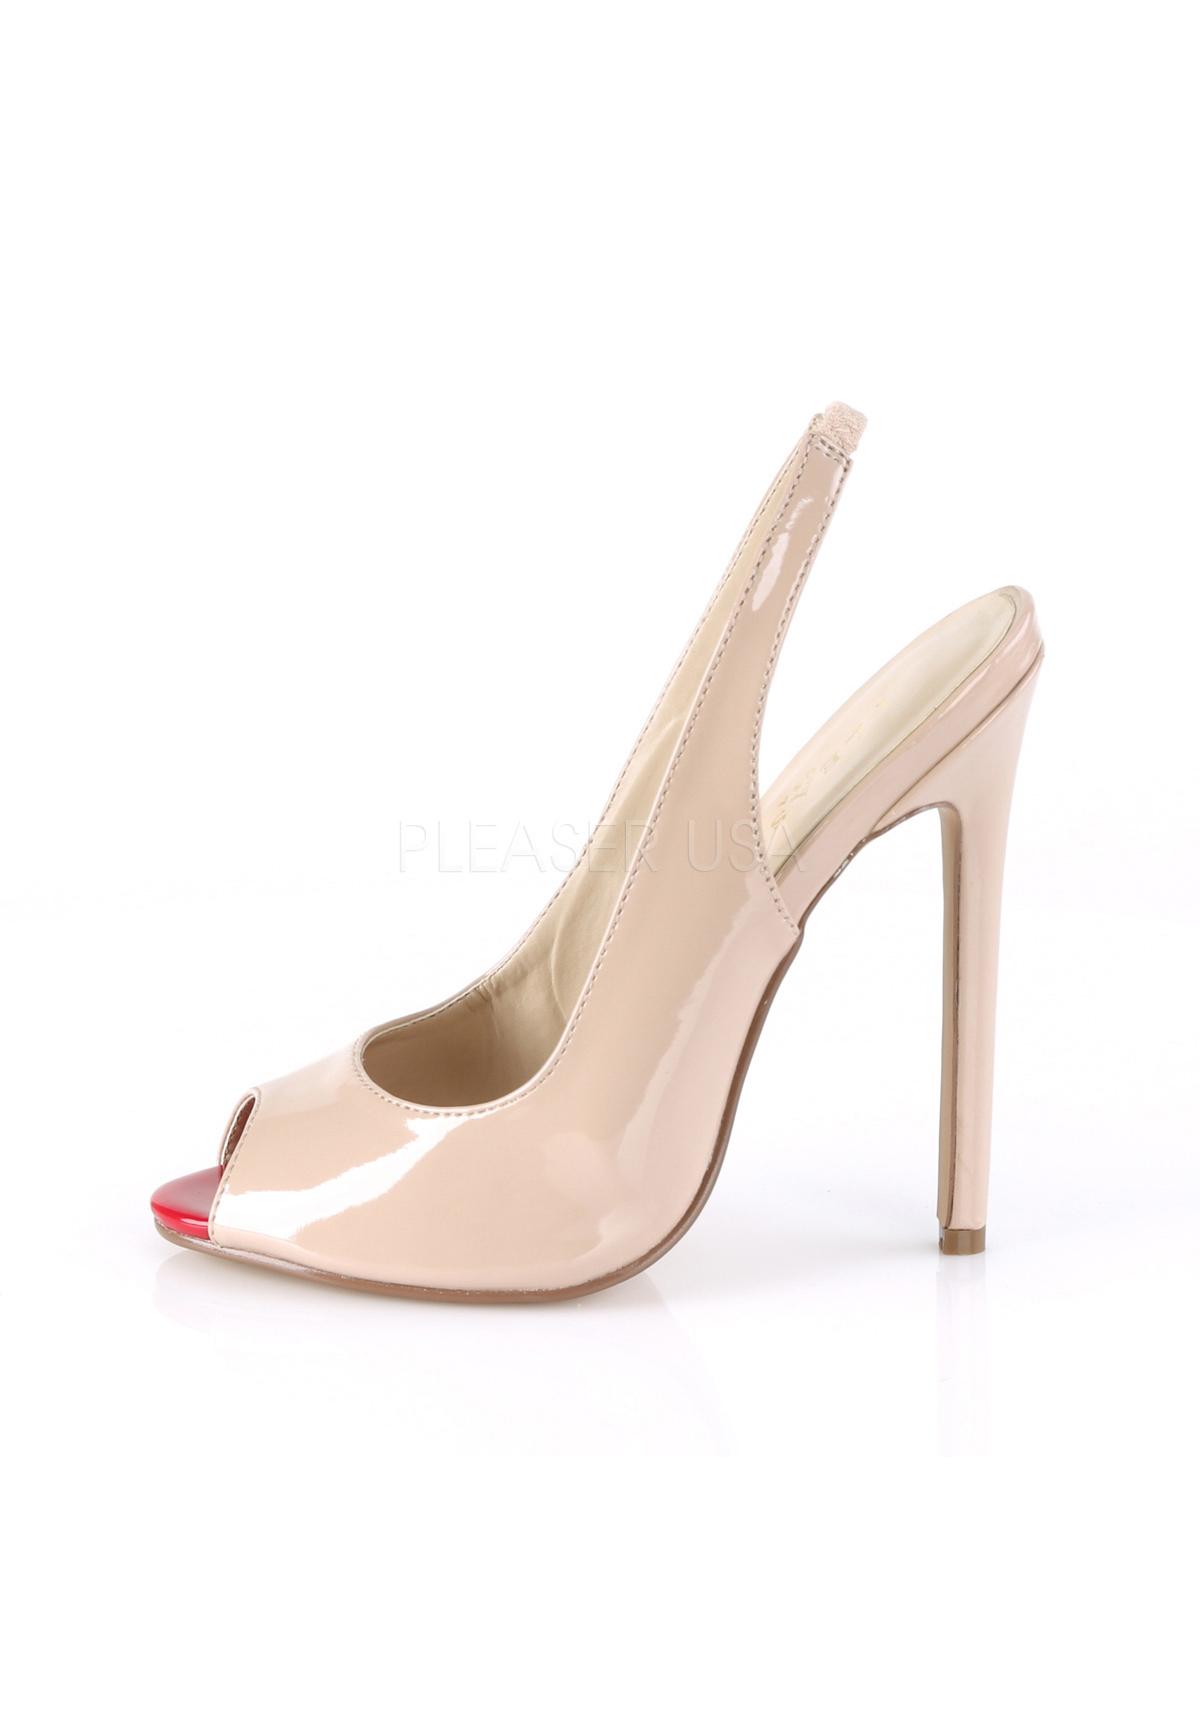 Pleaser SEXY-08 5 Inch Heel Slingback Peep Toe Pump